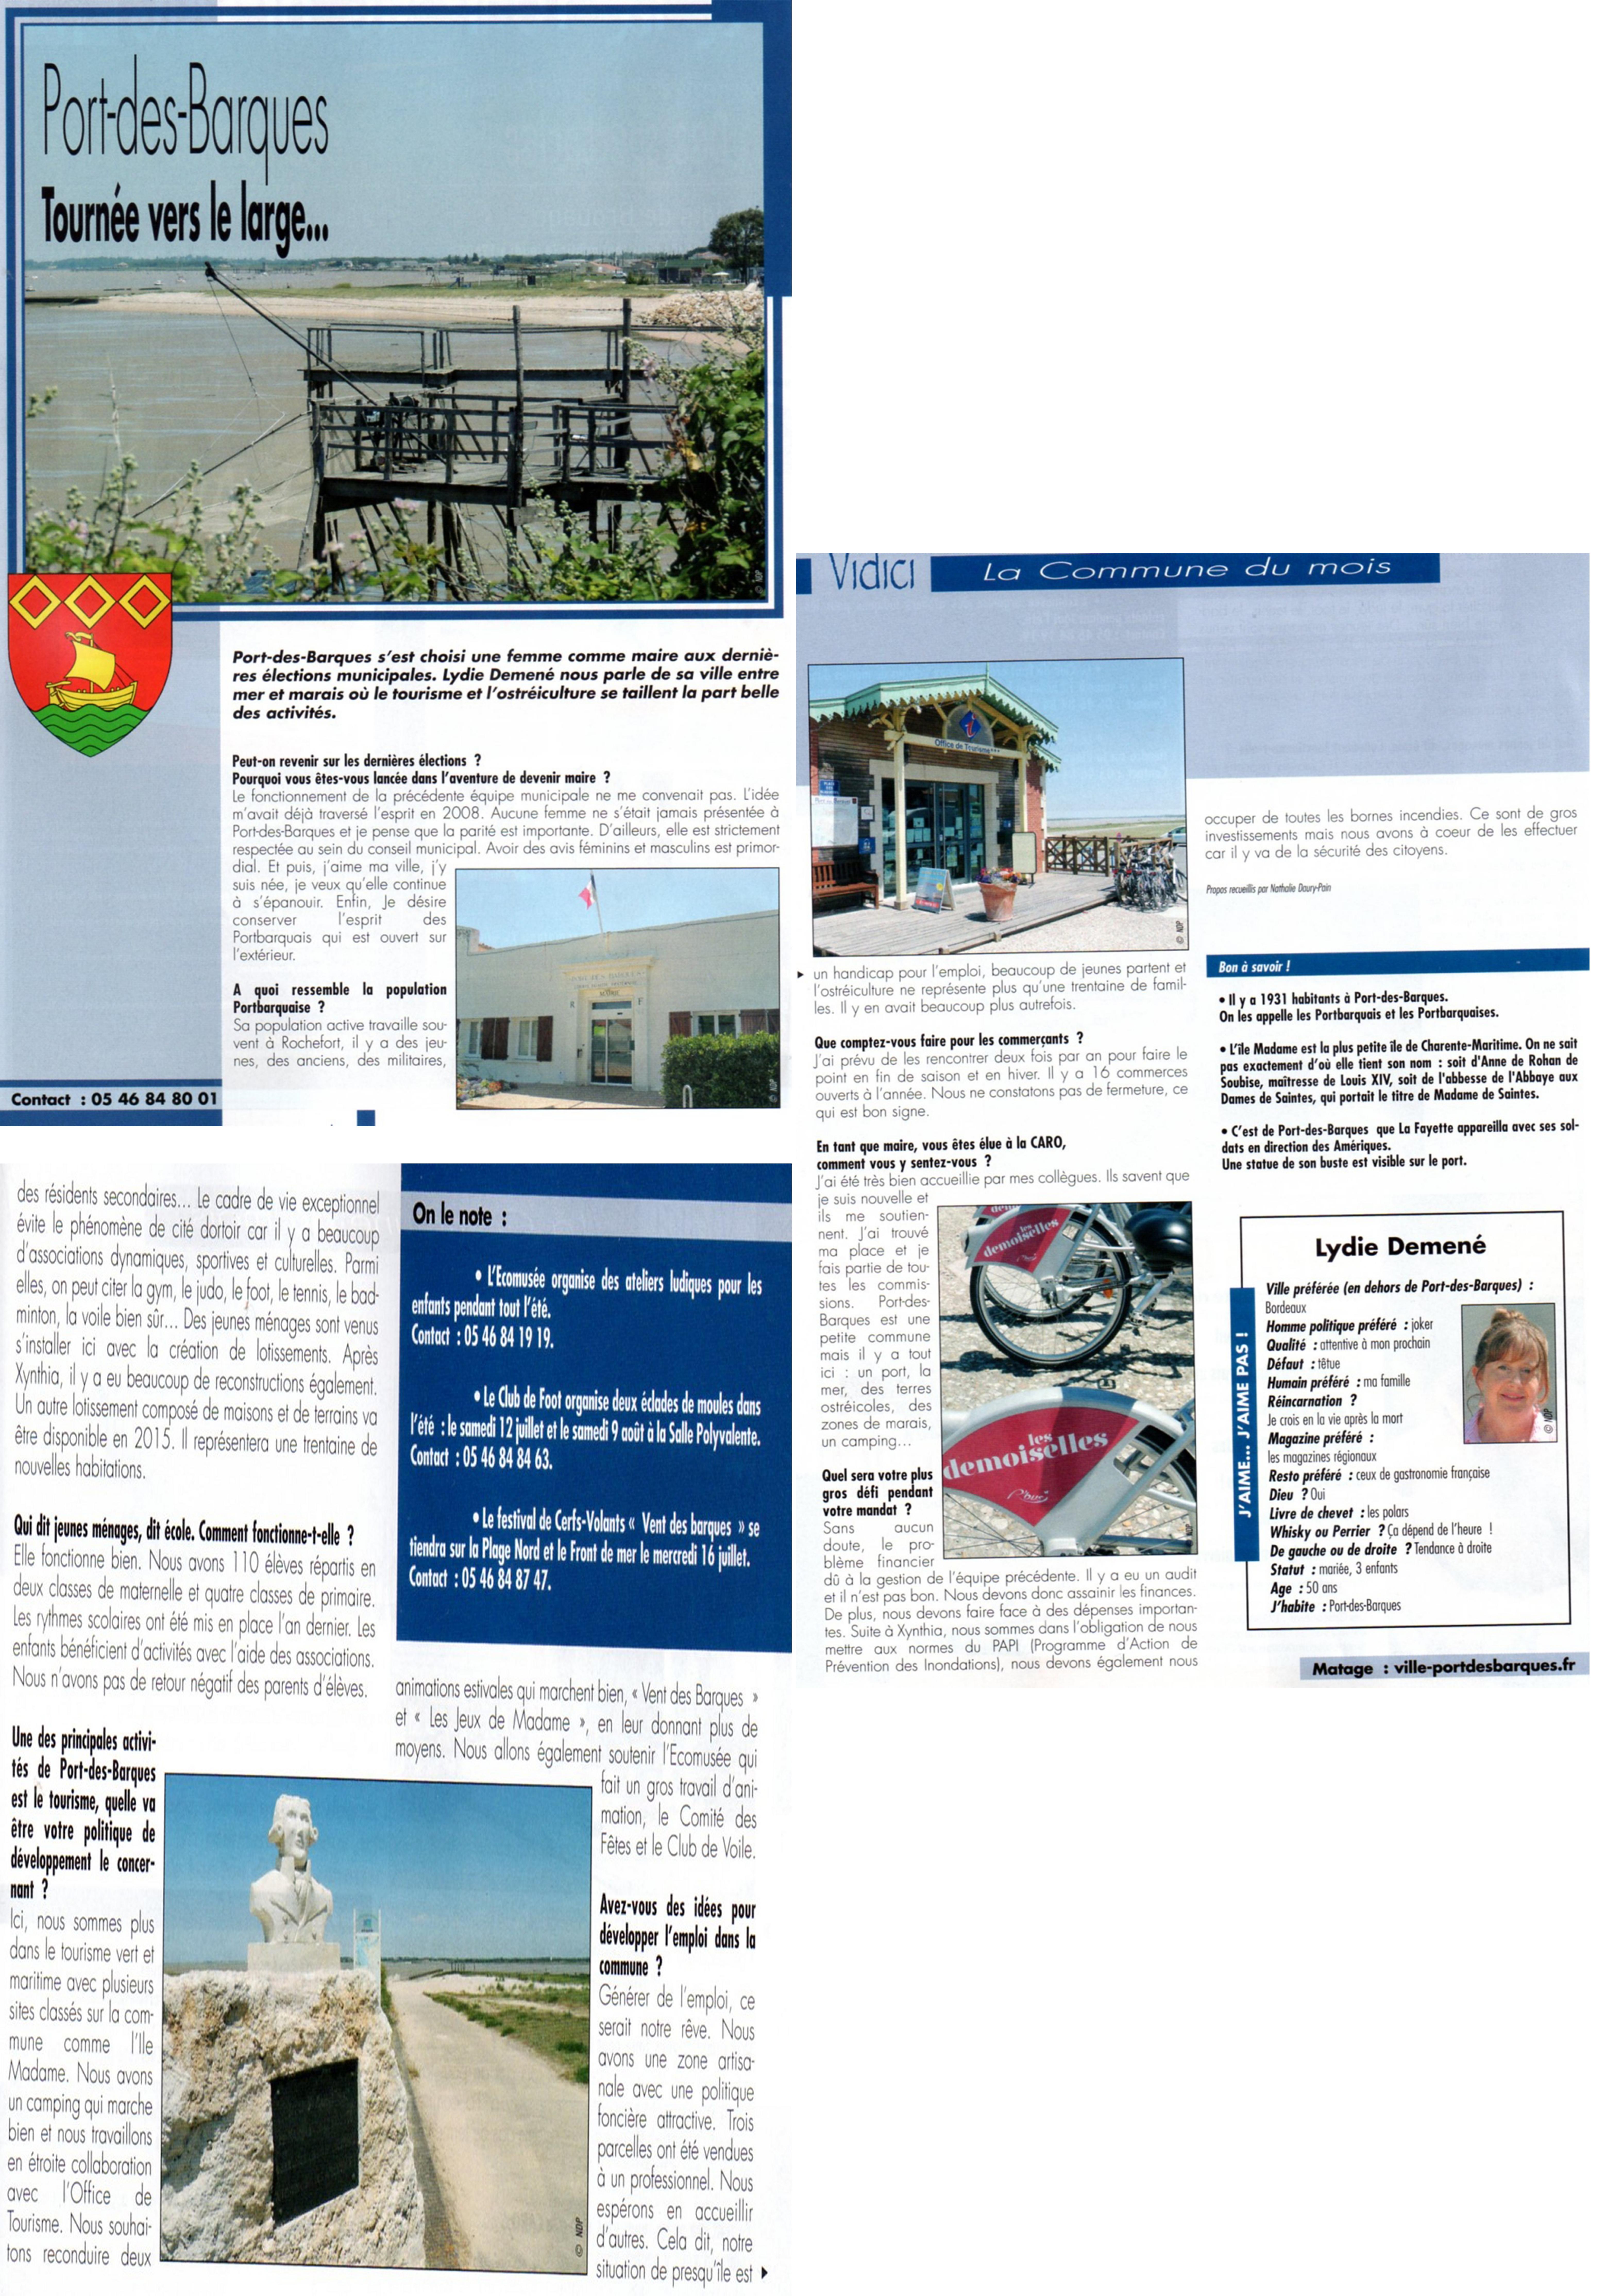 Magazine Vidici 07.2014